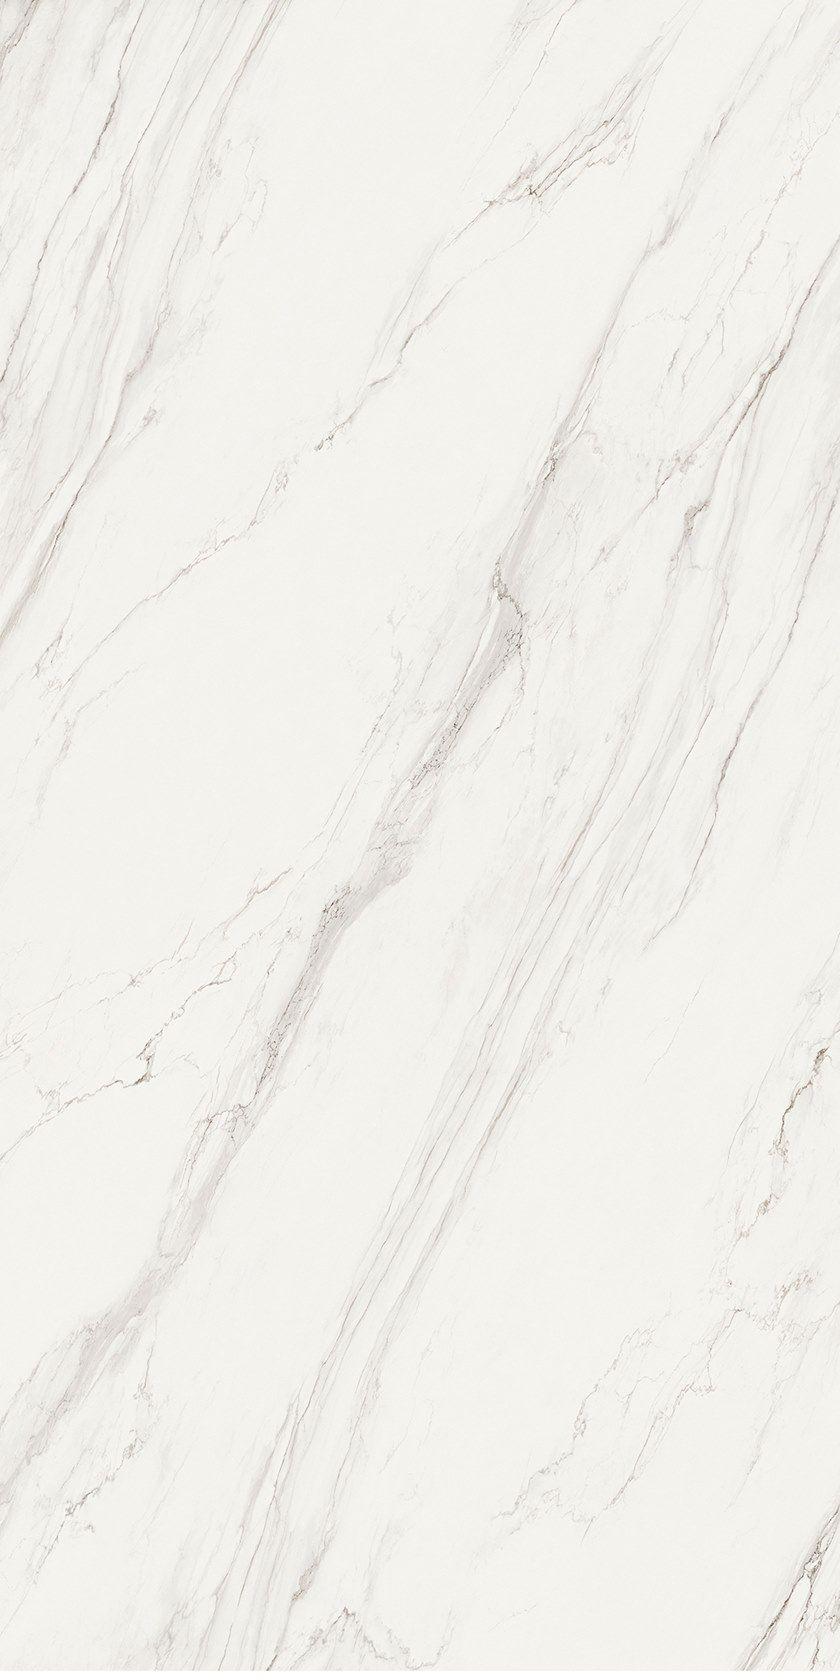 Touché Super Blanco-Gris Pulido Brillo / High-gloss Polished 150x300 cm